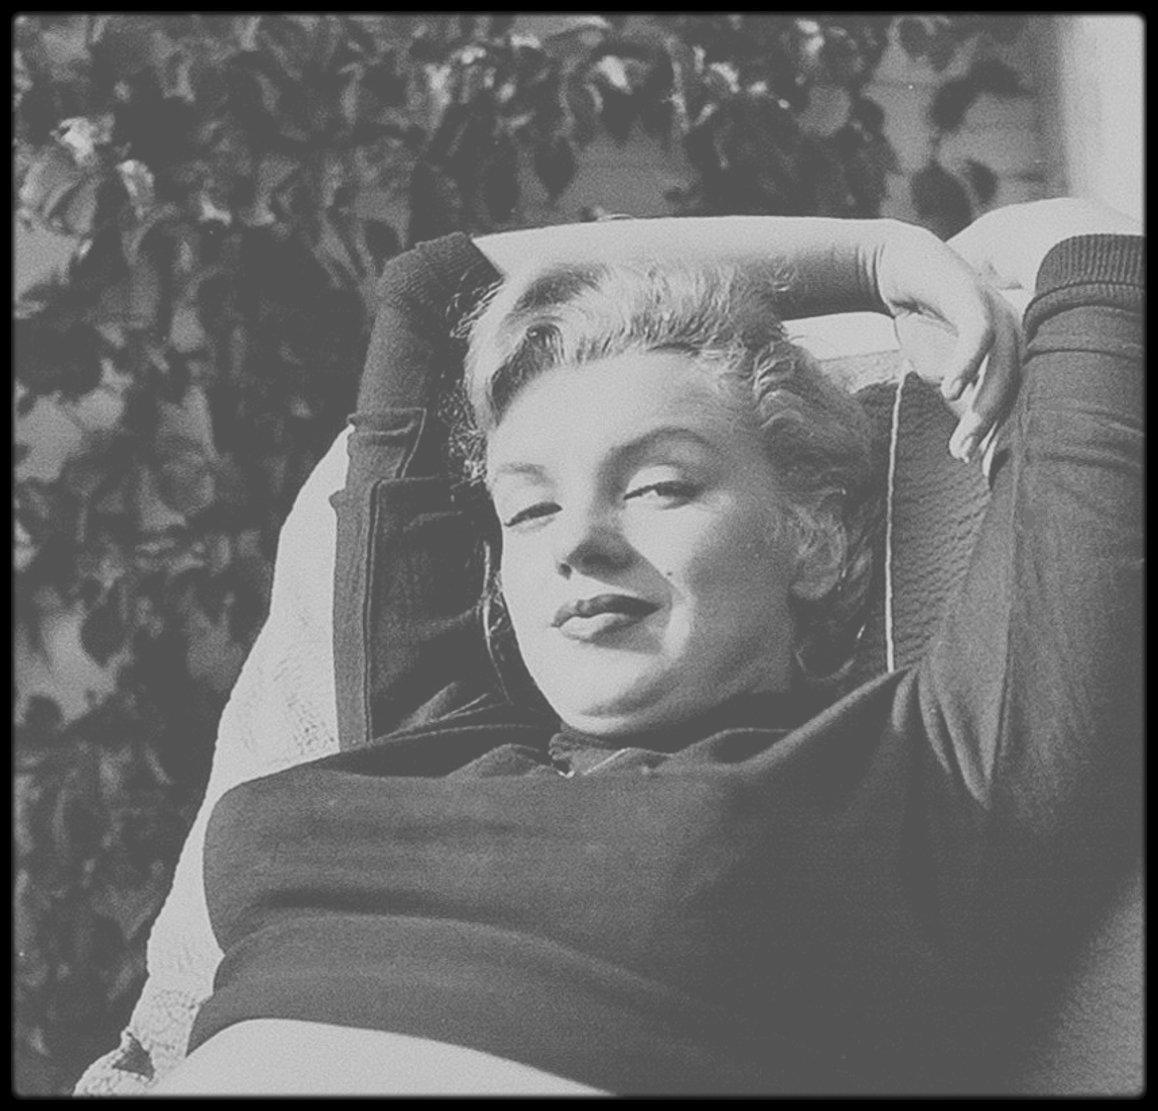 1950 / Hollywood, Marilyn vue par le photographe Bob BEERMAN.